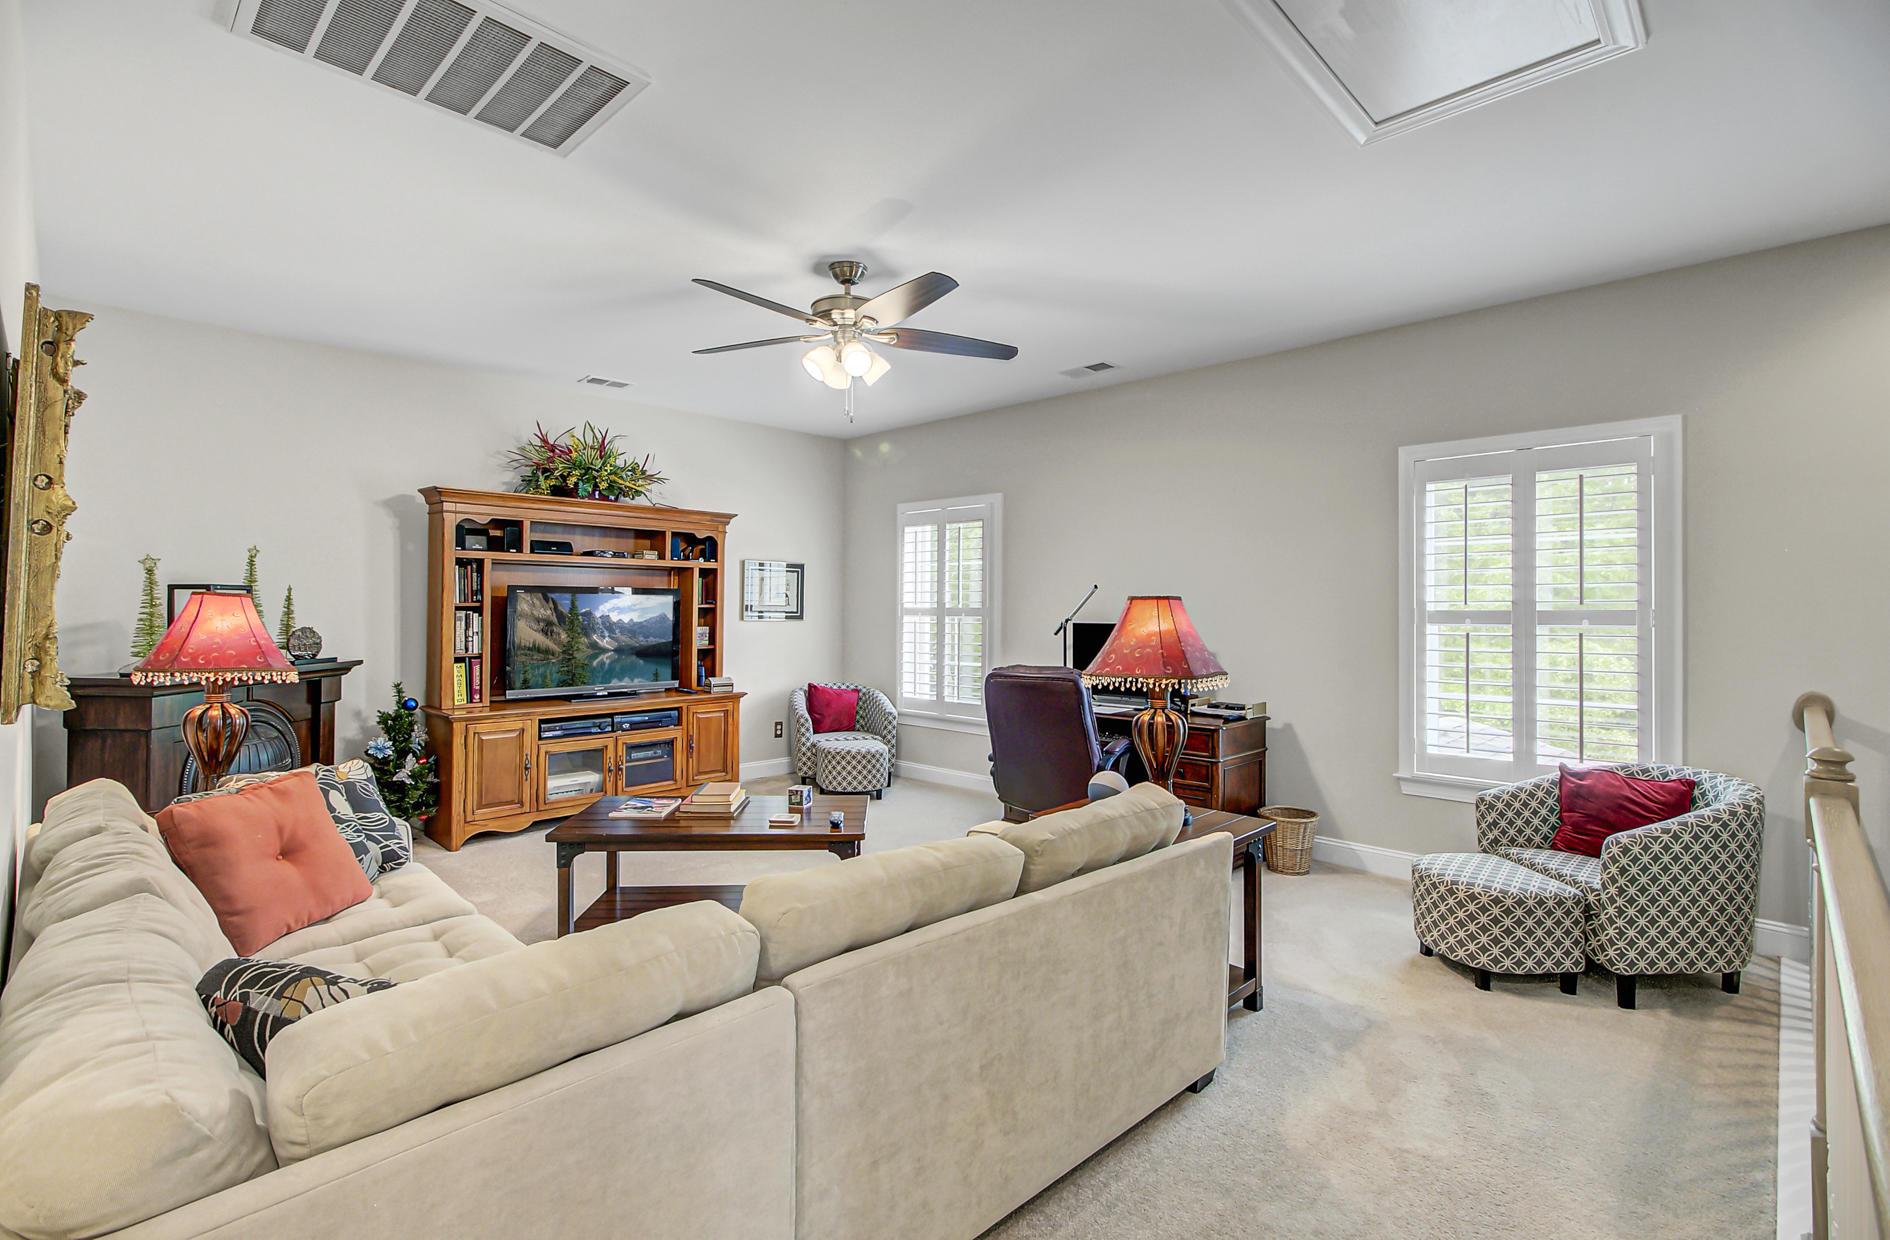 Park West Homes For Sale - 2824 Wagner, Mount Pleasant, SC - 2